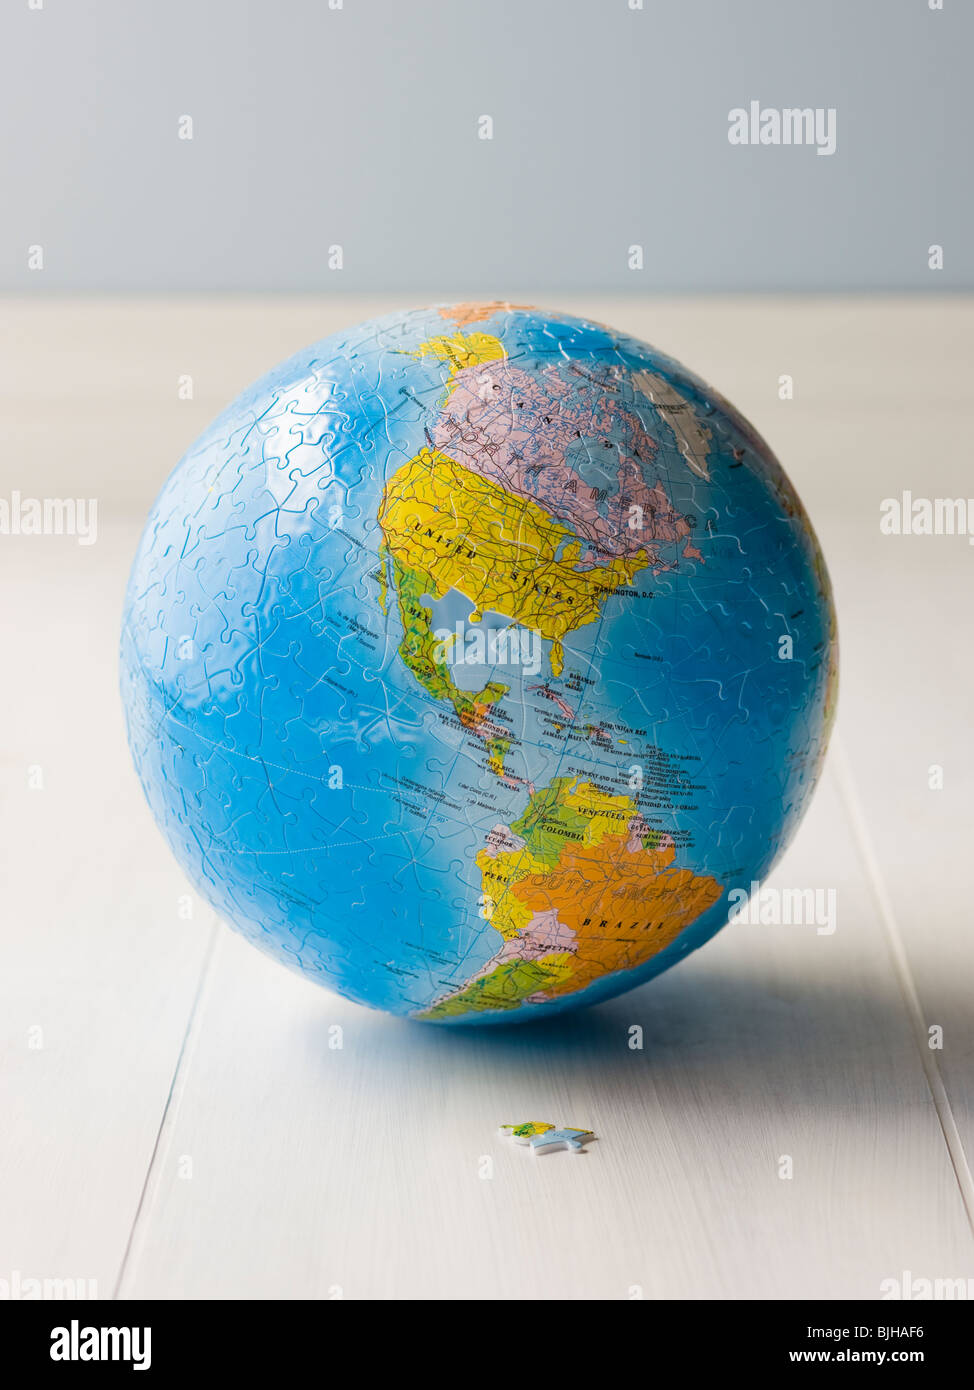 Planeta Tierra rompecabezas Imagen De Stock